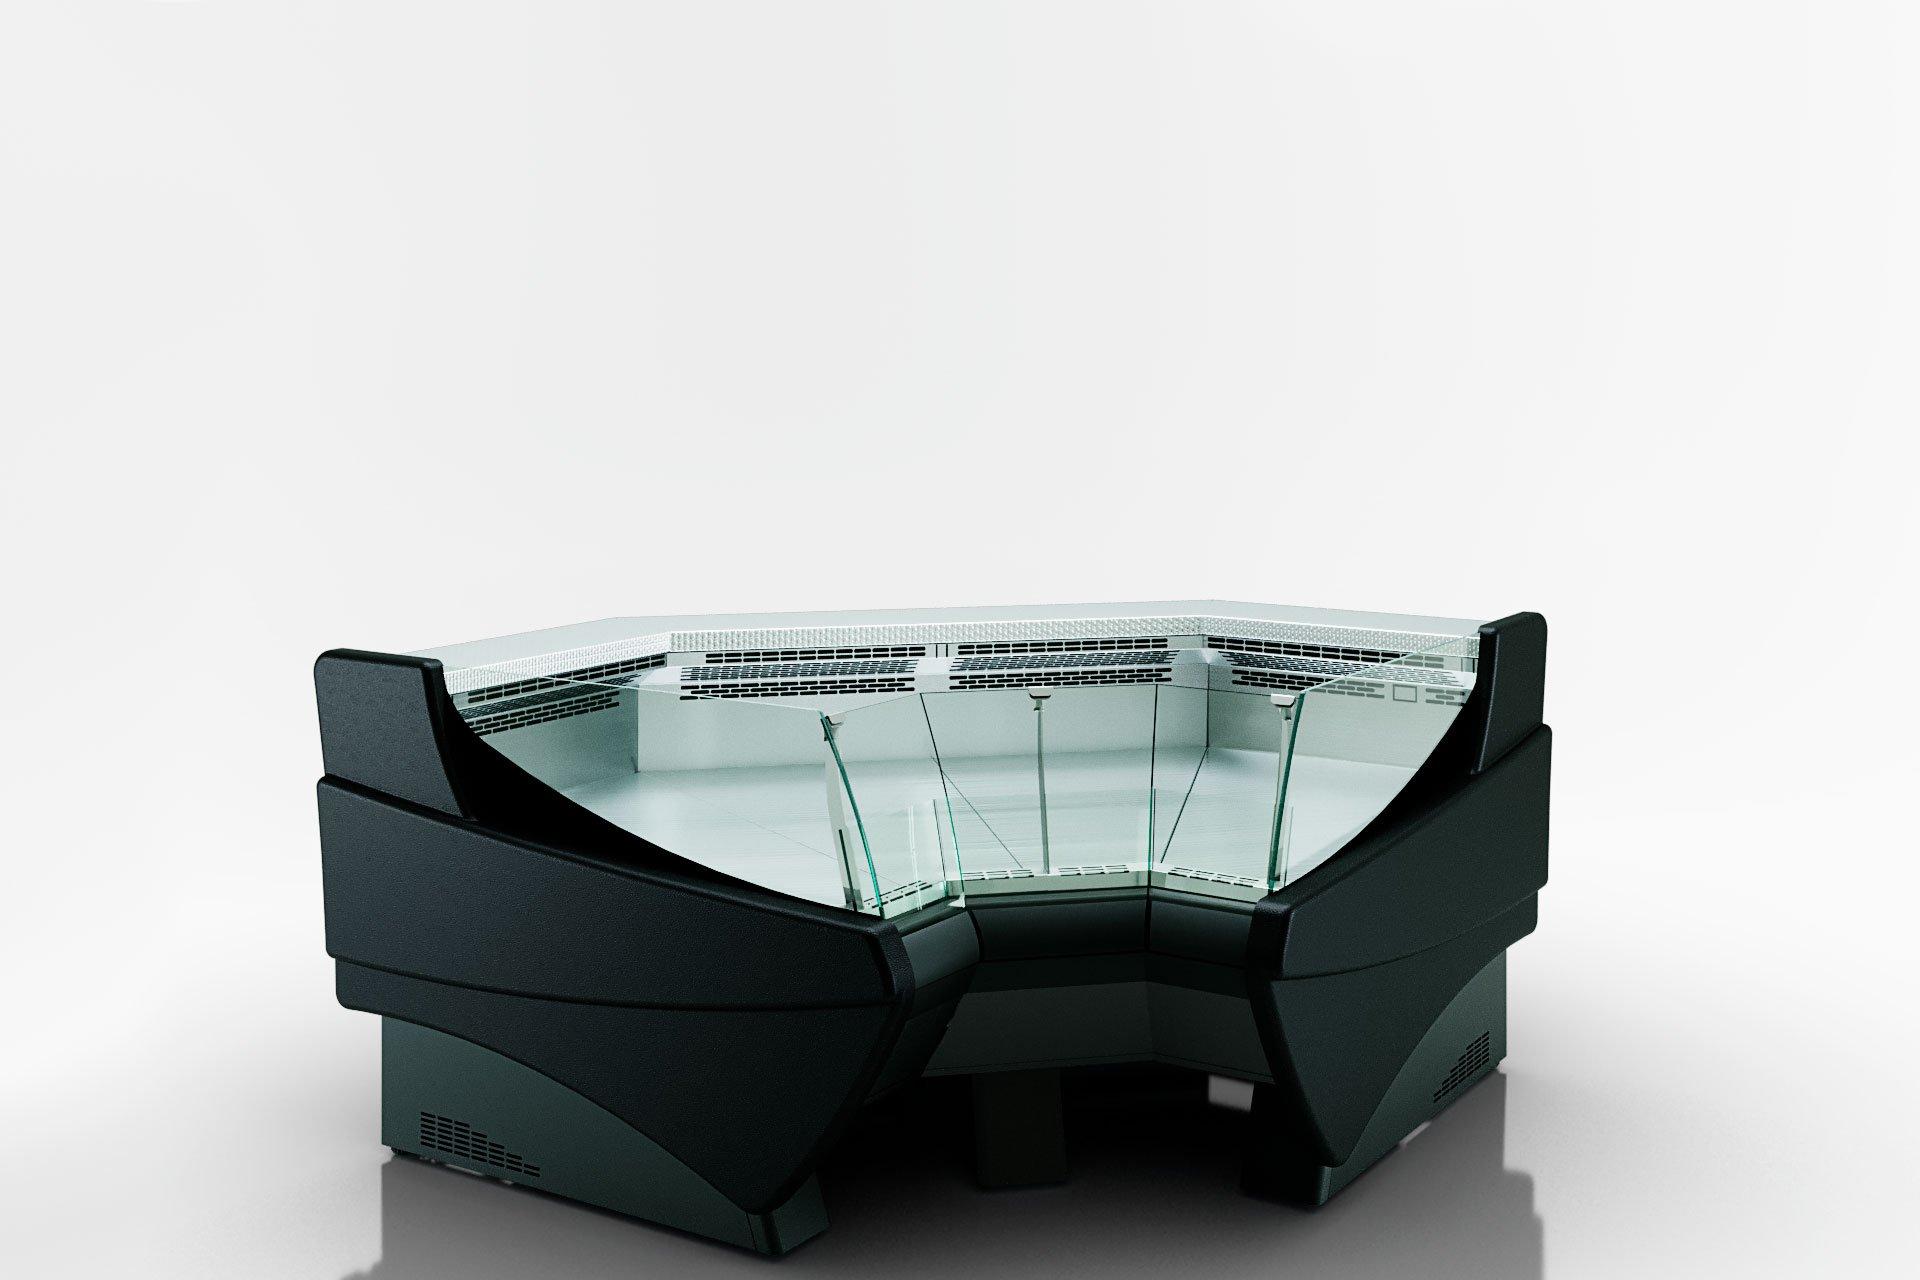 Kühlvitrinen Symphony luxe MG 120 deli self 085-DLM-IS90